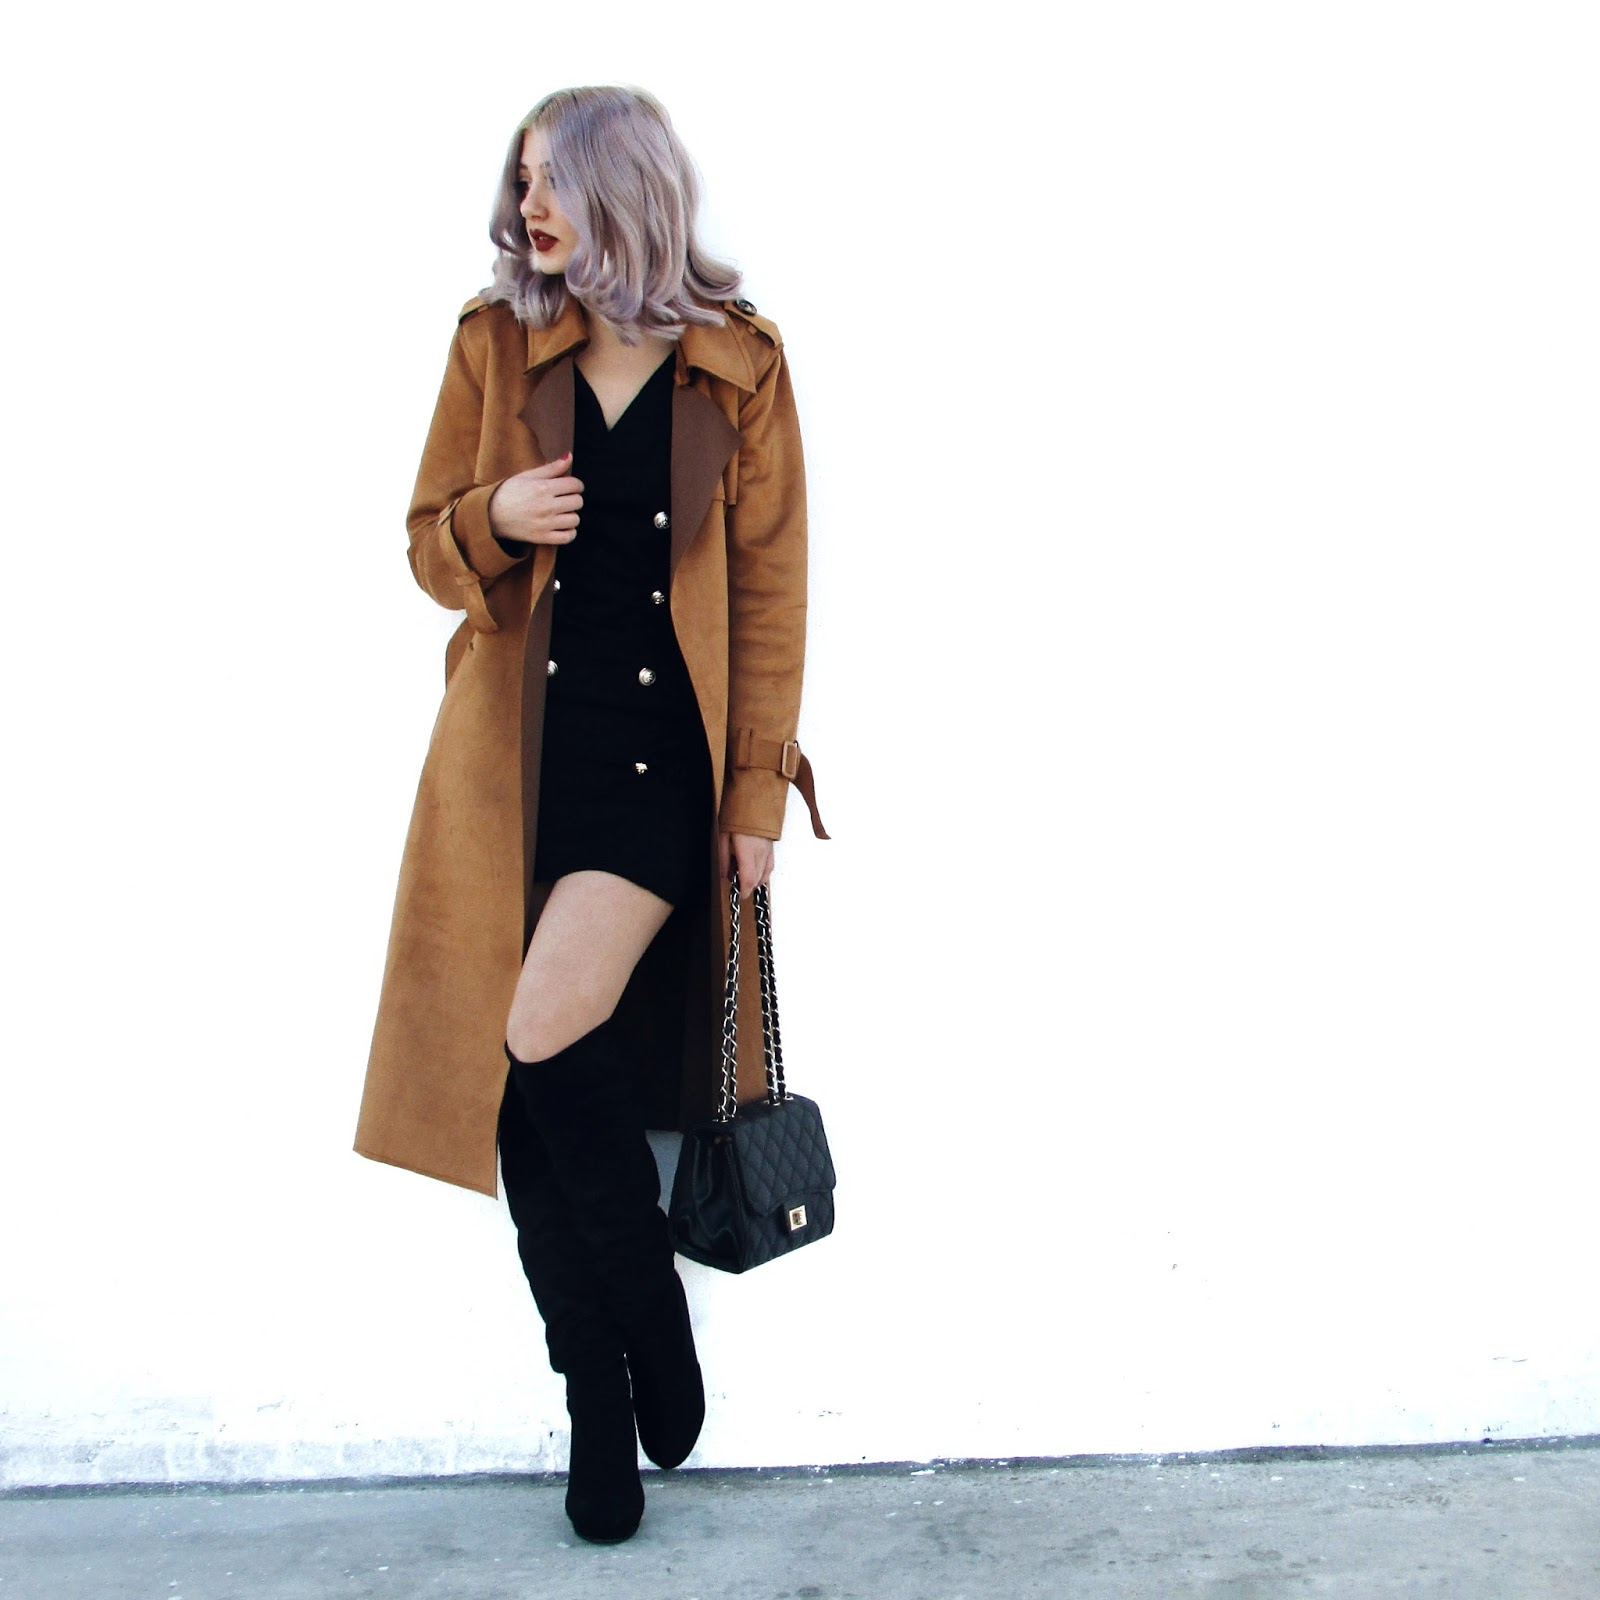 greek fashion blogger 2016